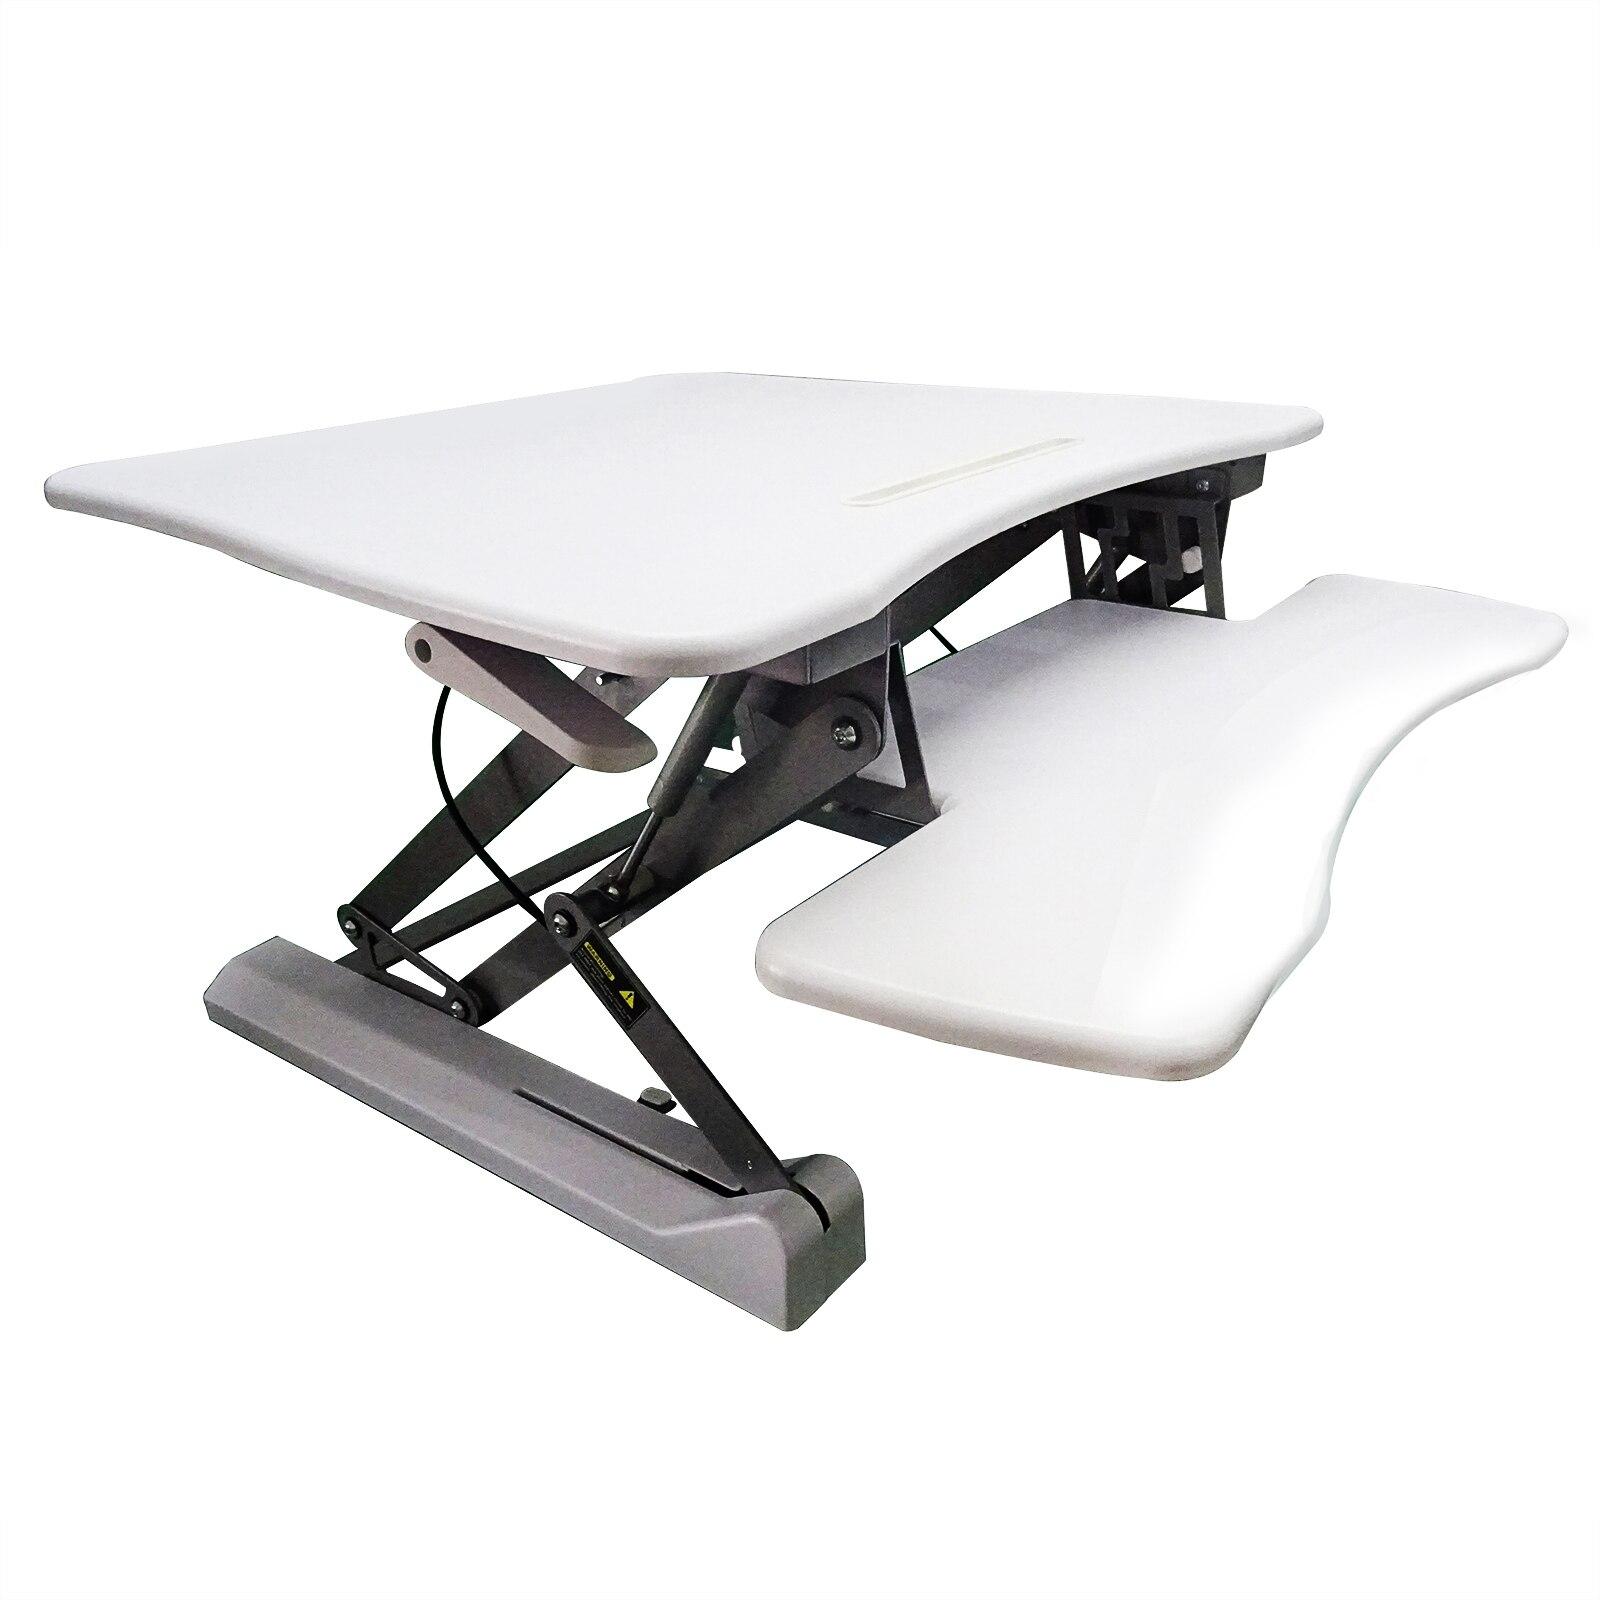 90x59CM Adjustable Height Stand Up Desk TV Stand Computer Office Laptop Workstation Holder black white MAYITR